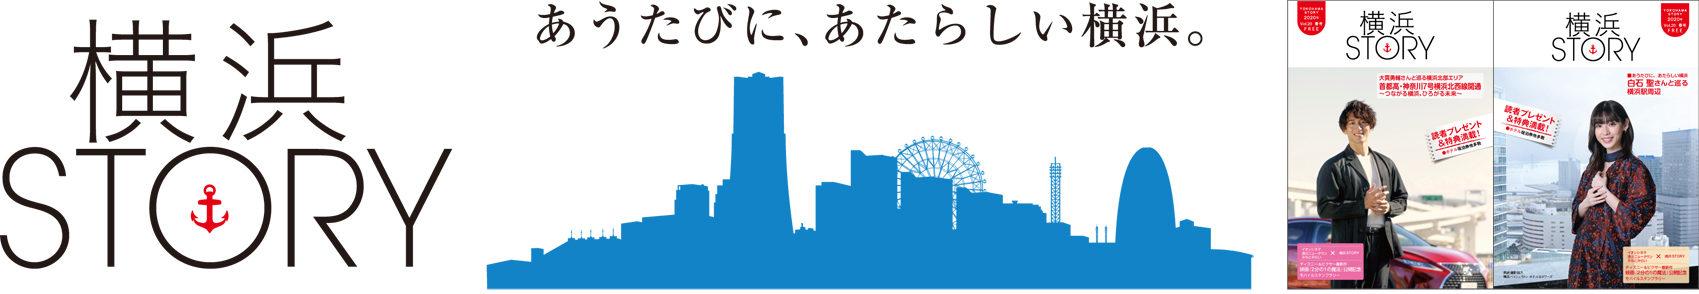 横浜STORY